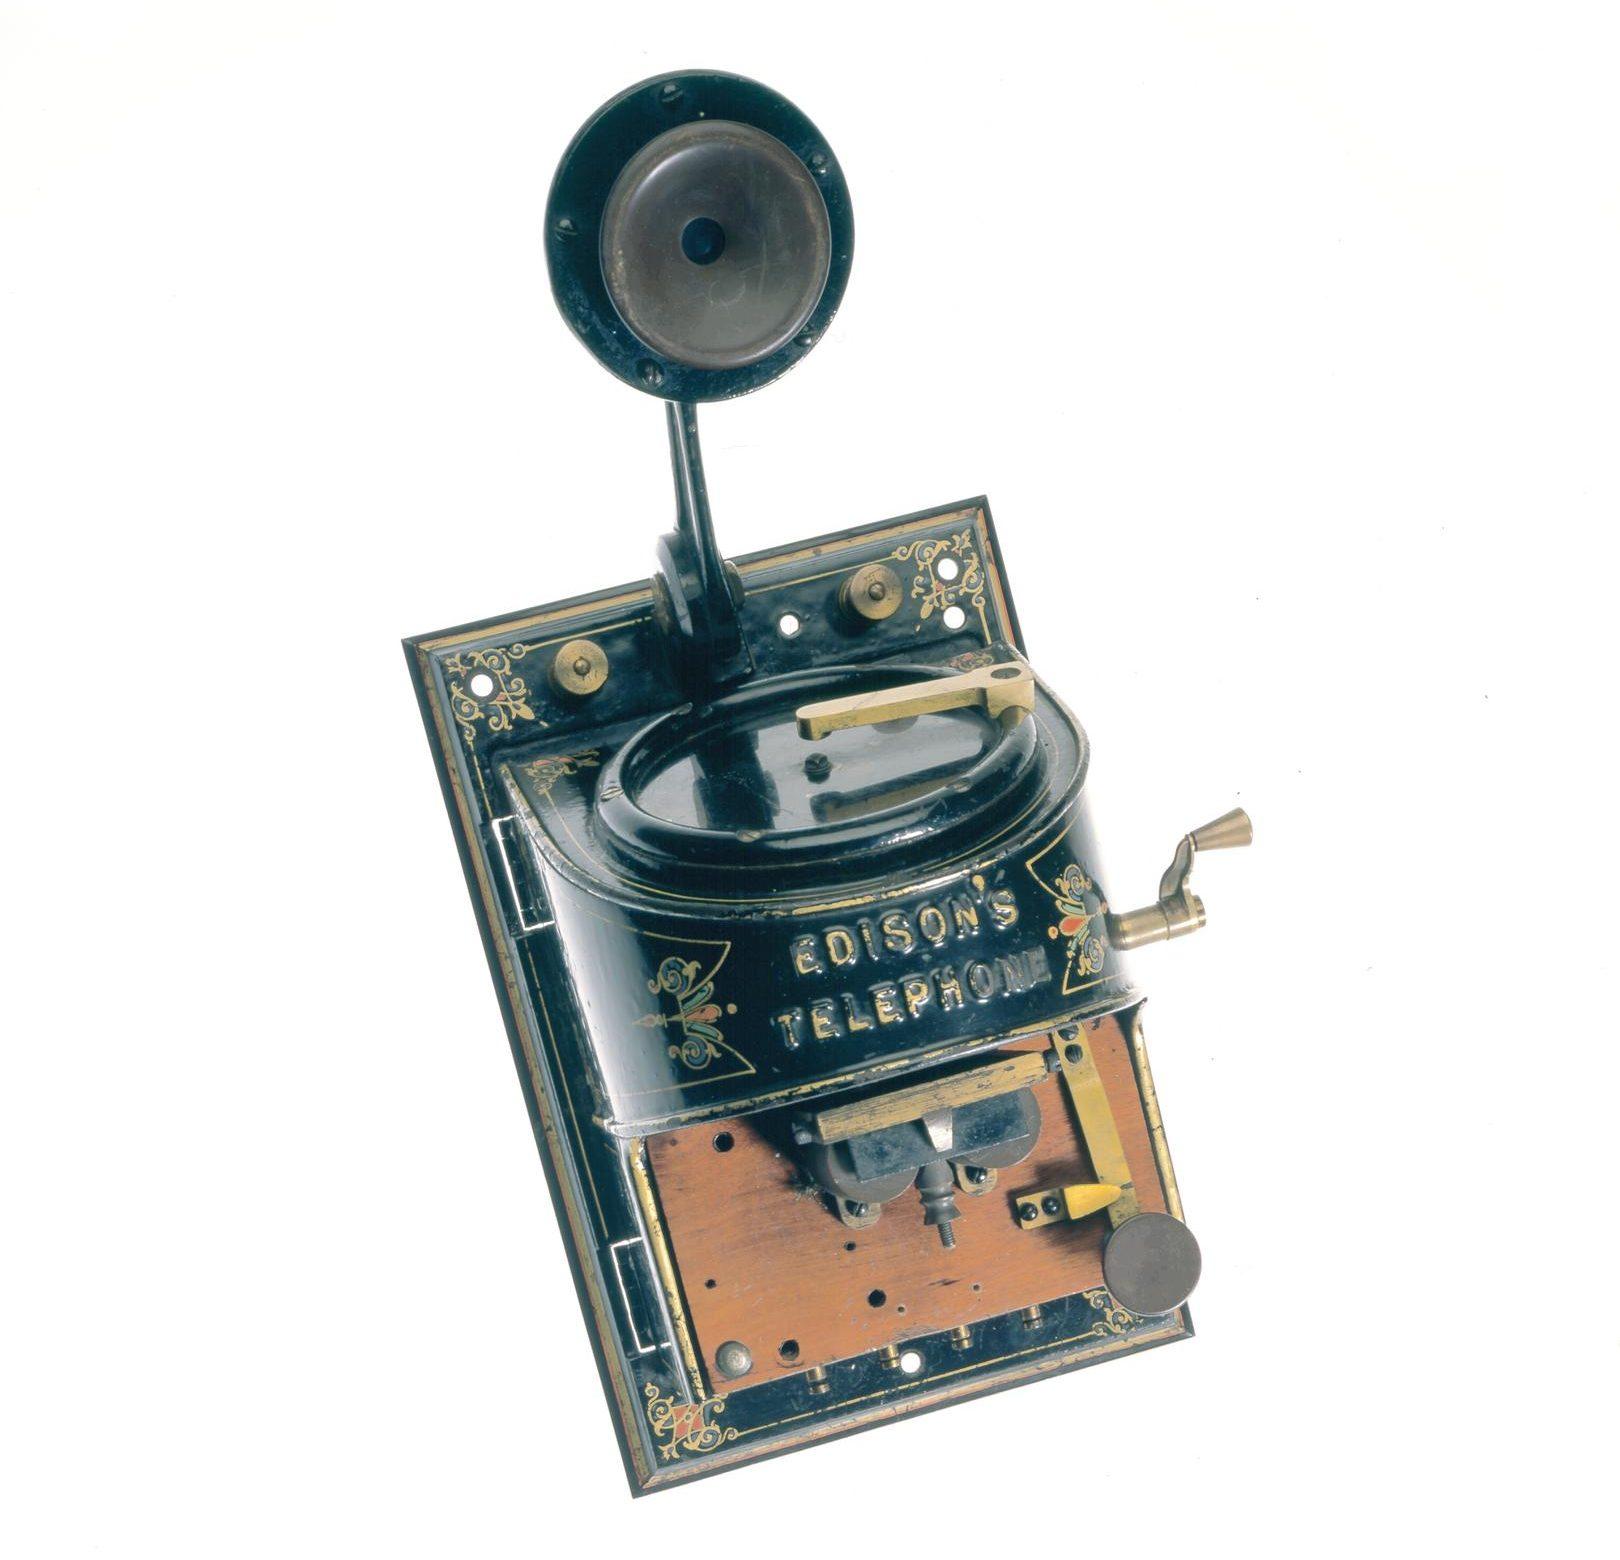 Edison loud-speaking telephone. Designe dby Thomas Edison, USA, 1879